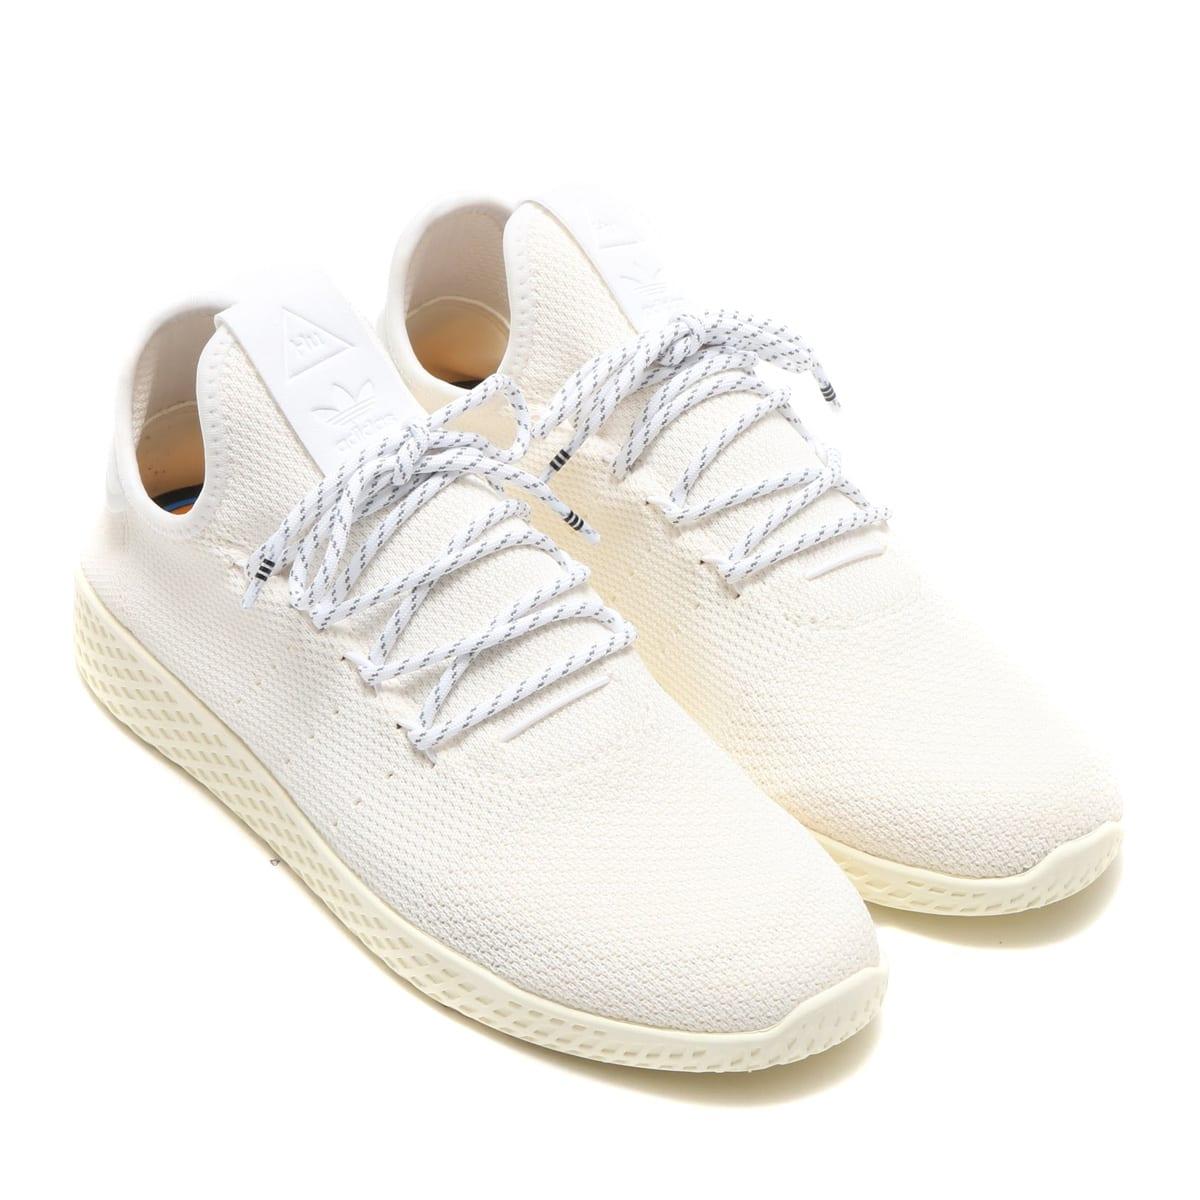 adidas Originals PW HU HOLI TENNIS HU BC  Cream White/Cream White/Ftwr White_photo_large